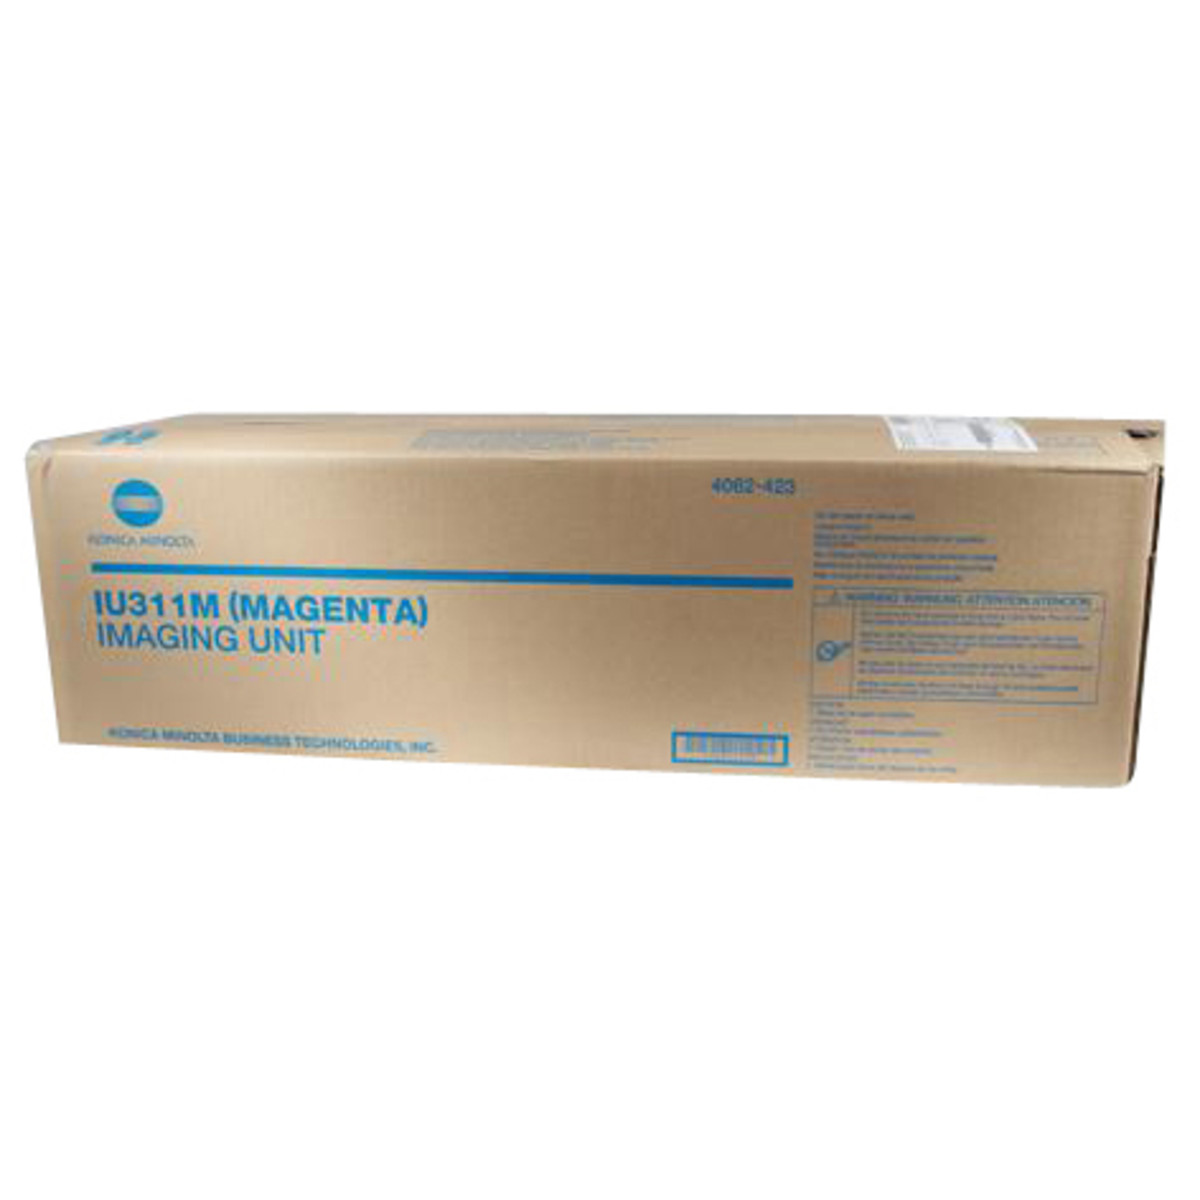 Konica Minolta 4062-423 Magenta Drum Unit